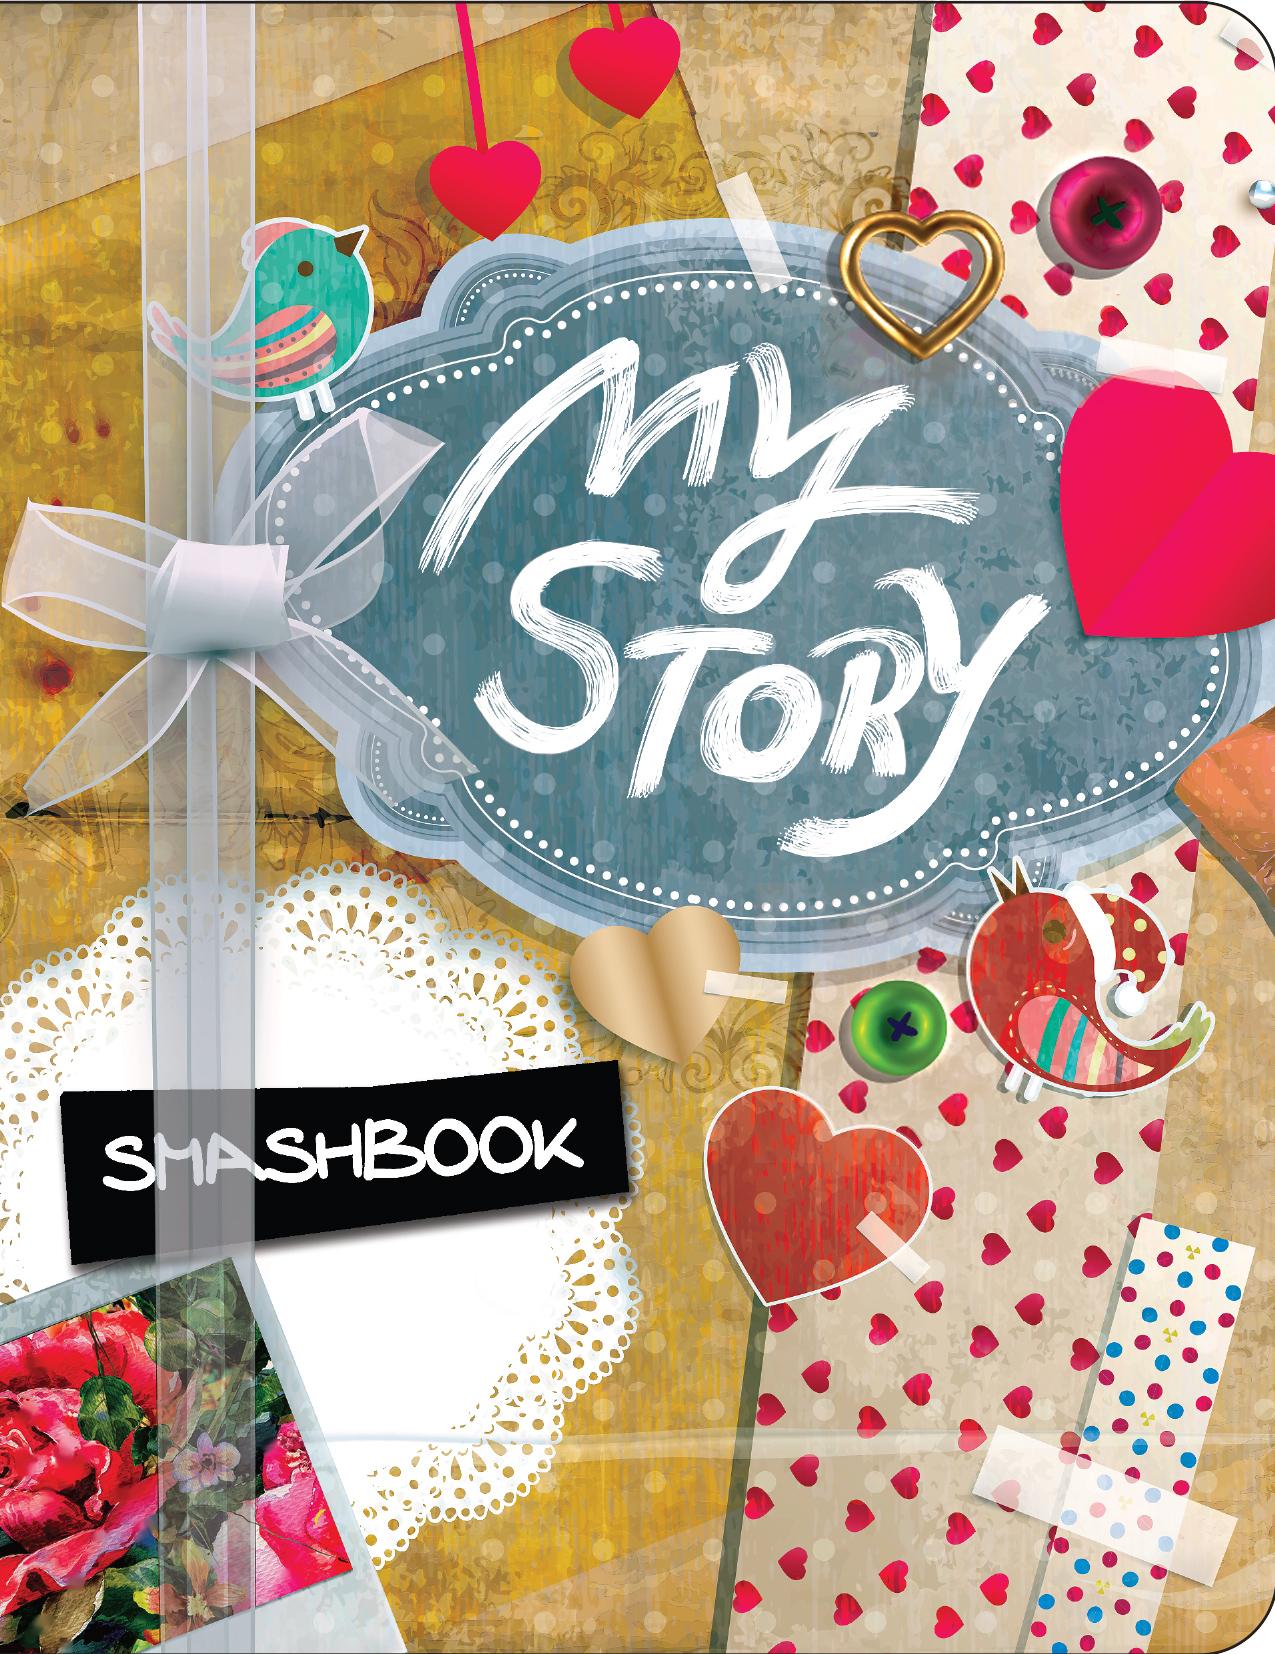 My story. Смэшбук. Блокнот для творческих людей (+ наклейки) смэшбук блокнот для творческих людей с наклейками а5 my life